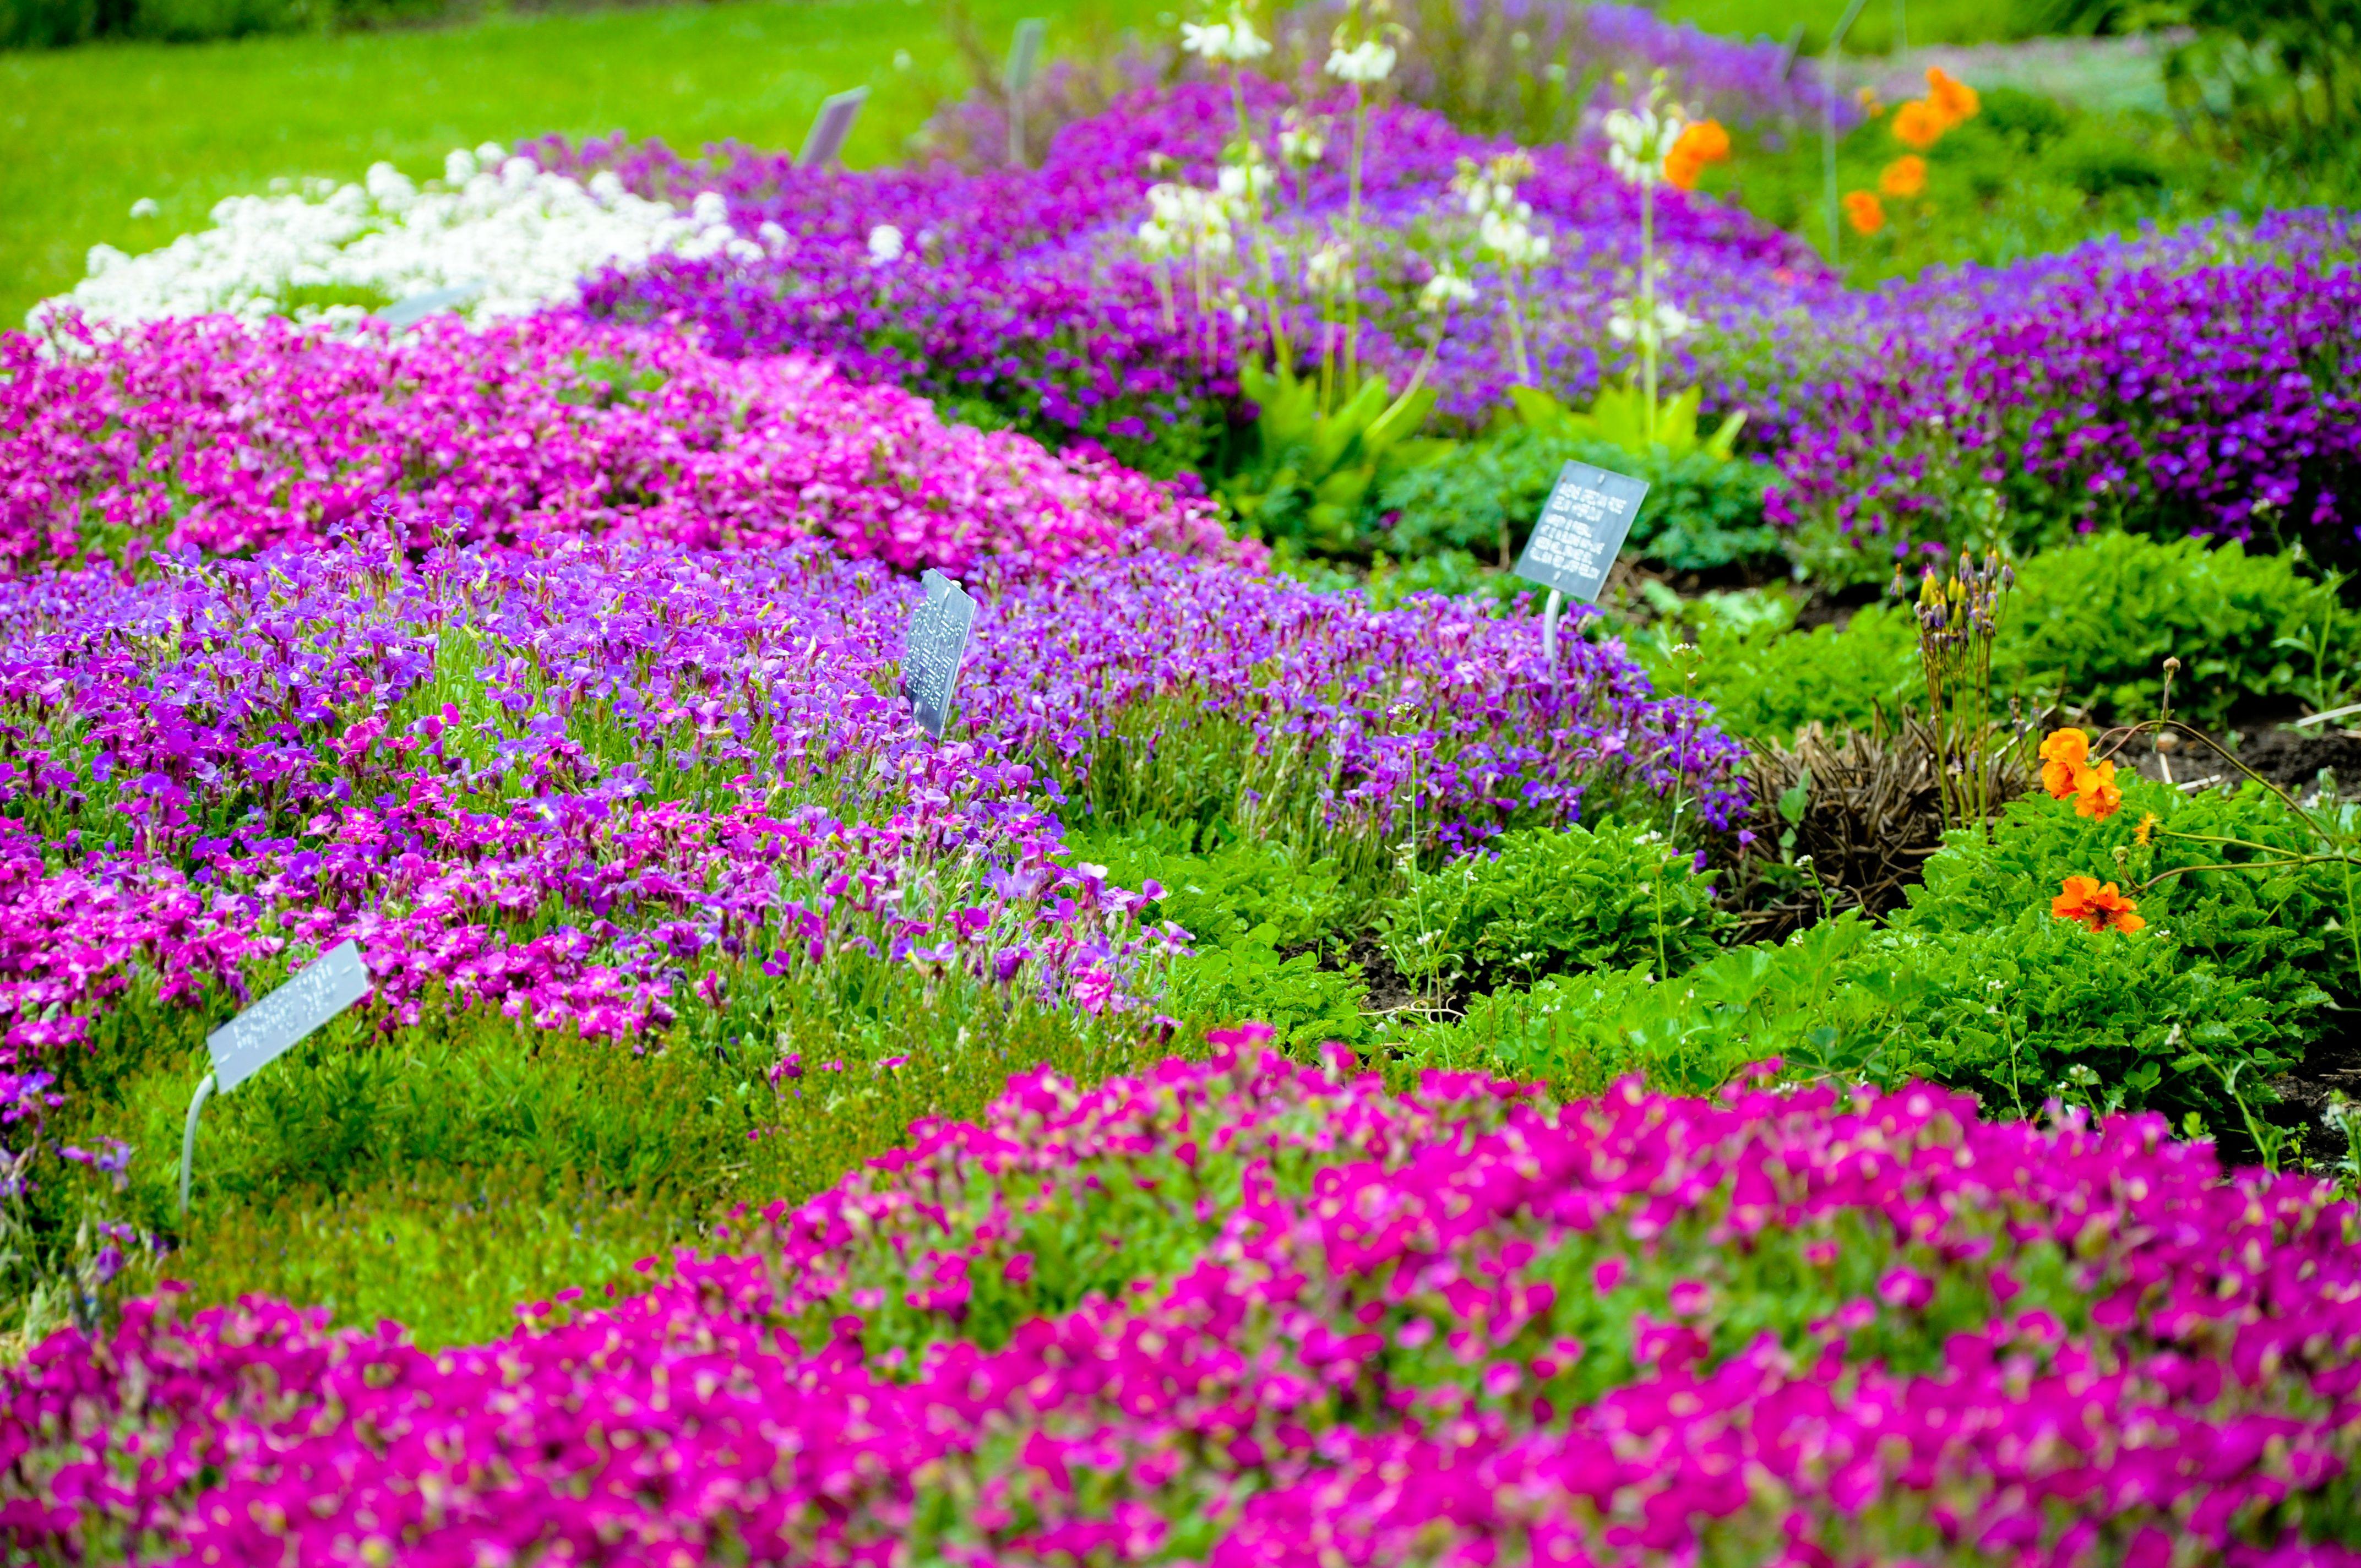 Garden of flowers by kayellaneza on deviantart gardens galore garden of flowers by kayellaneza on deviantart izmirmasajfo